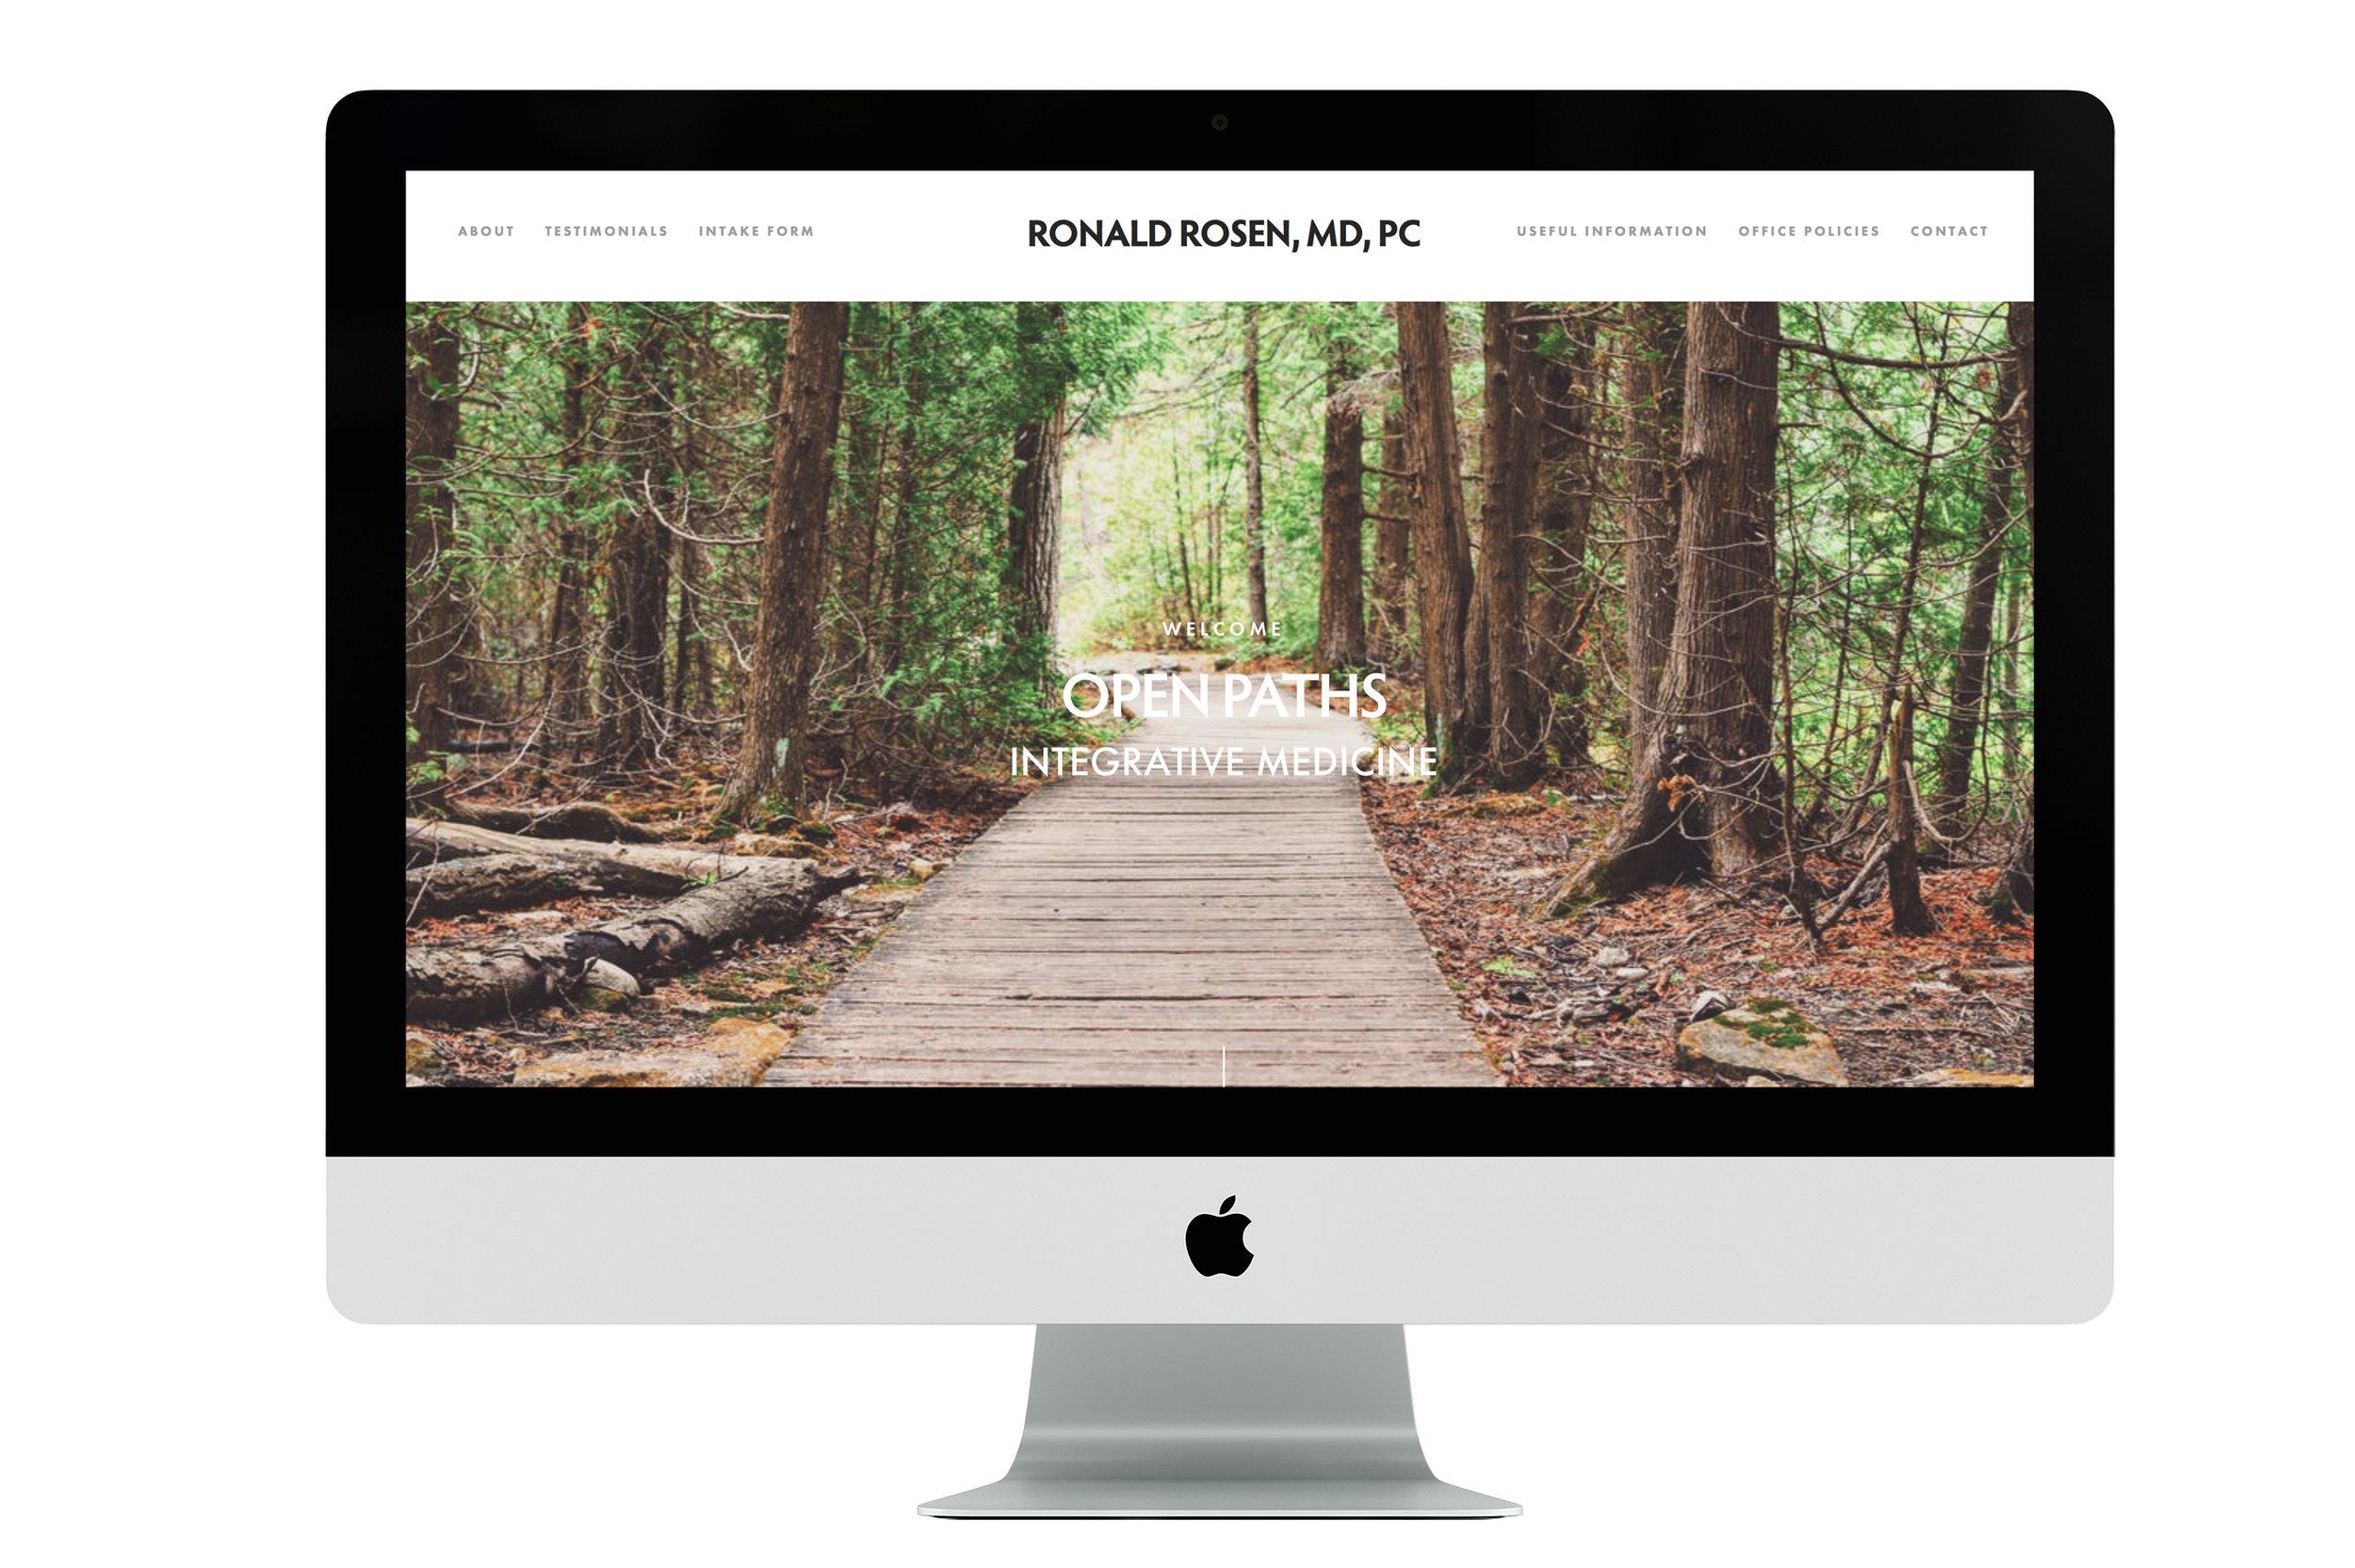 web_design_kdc_open_paths.jpg